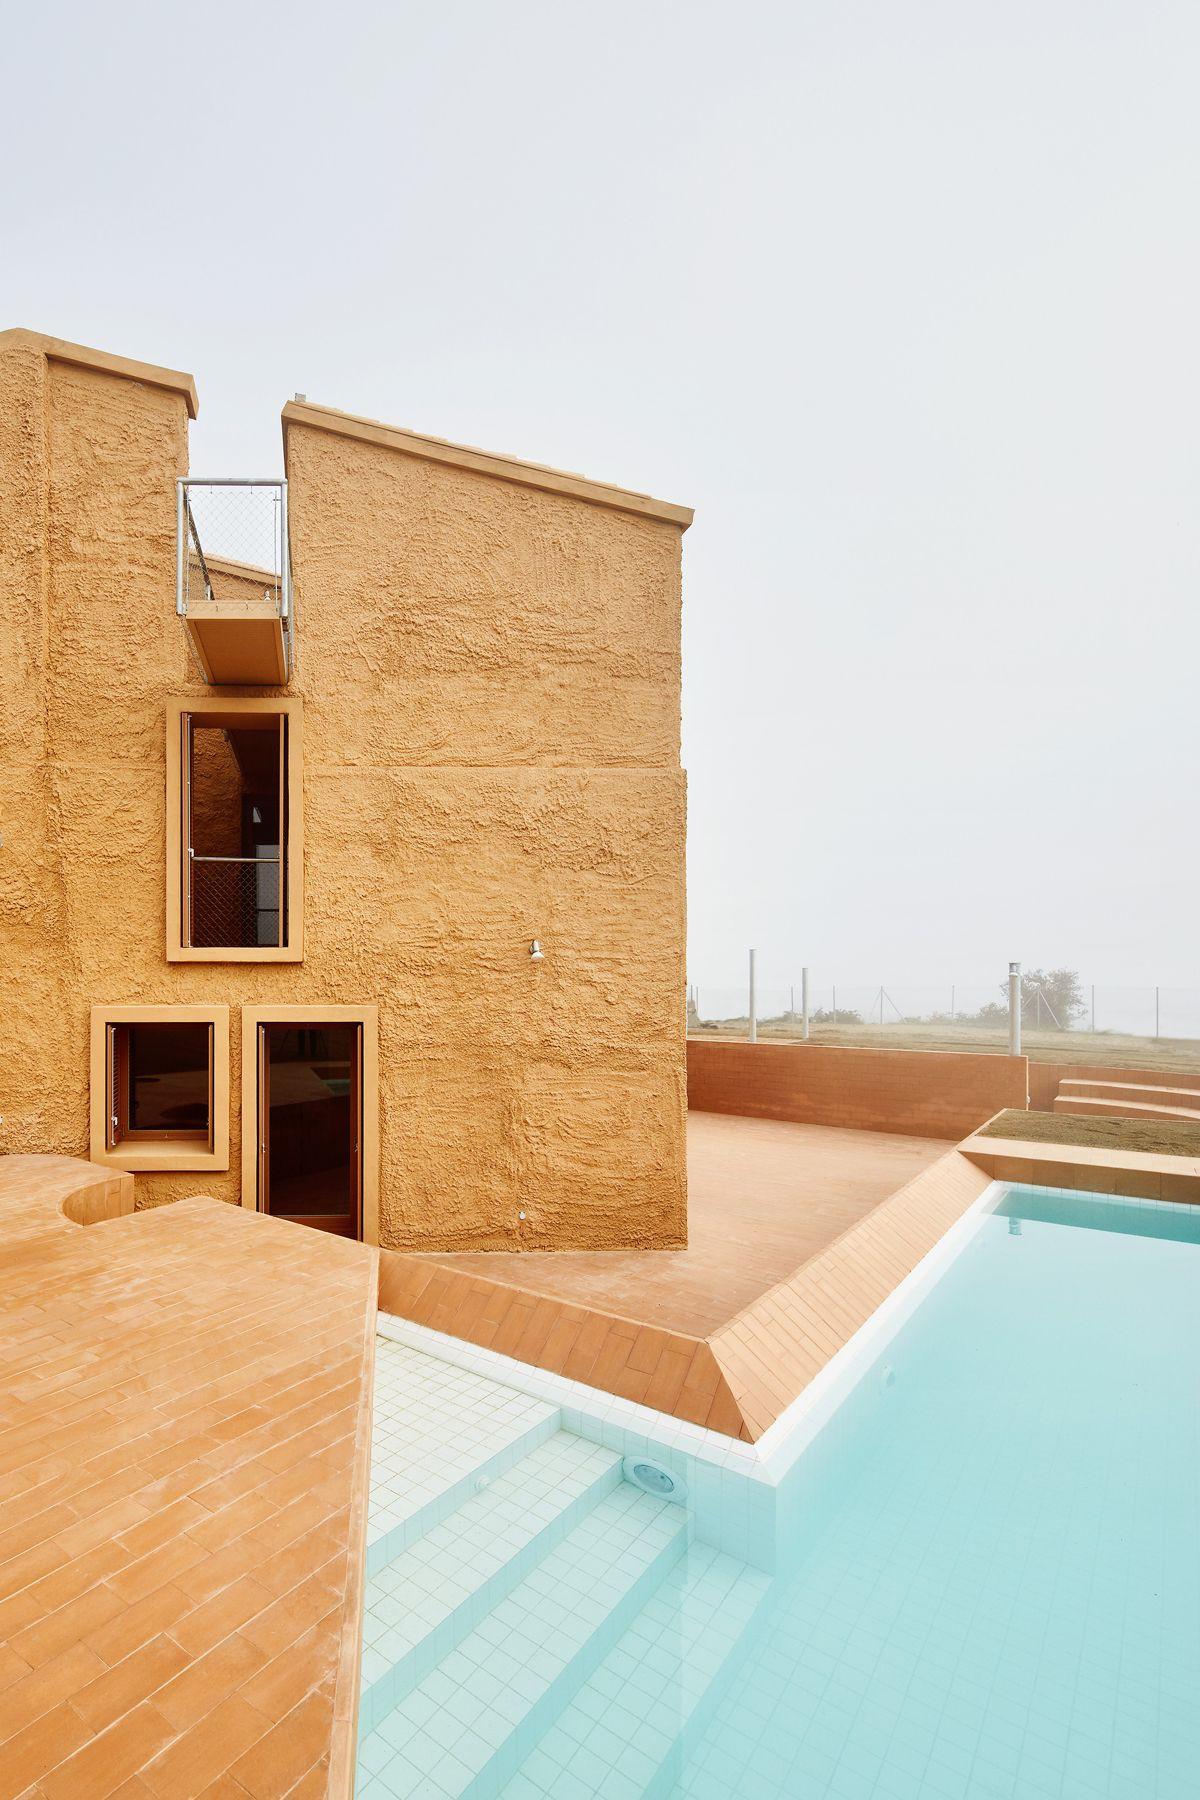 stepienybarno-stepien-y-barno-arquitectura-ProyectoDelDia-afasia-archzine-arquitectura-g-josé hevia